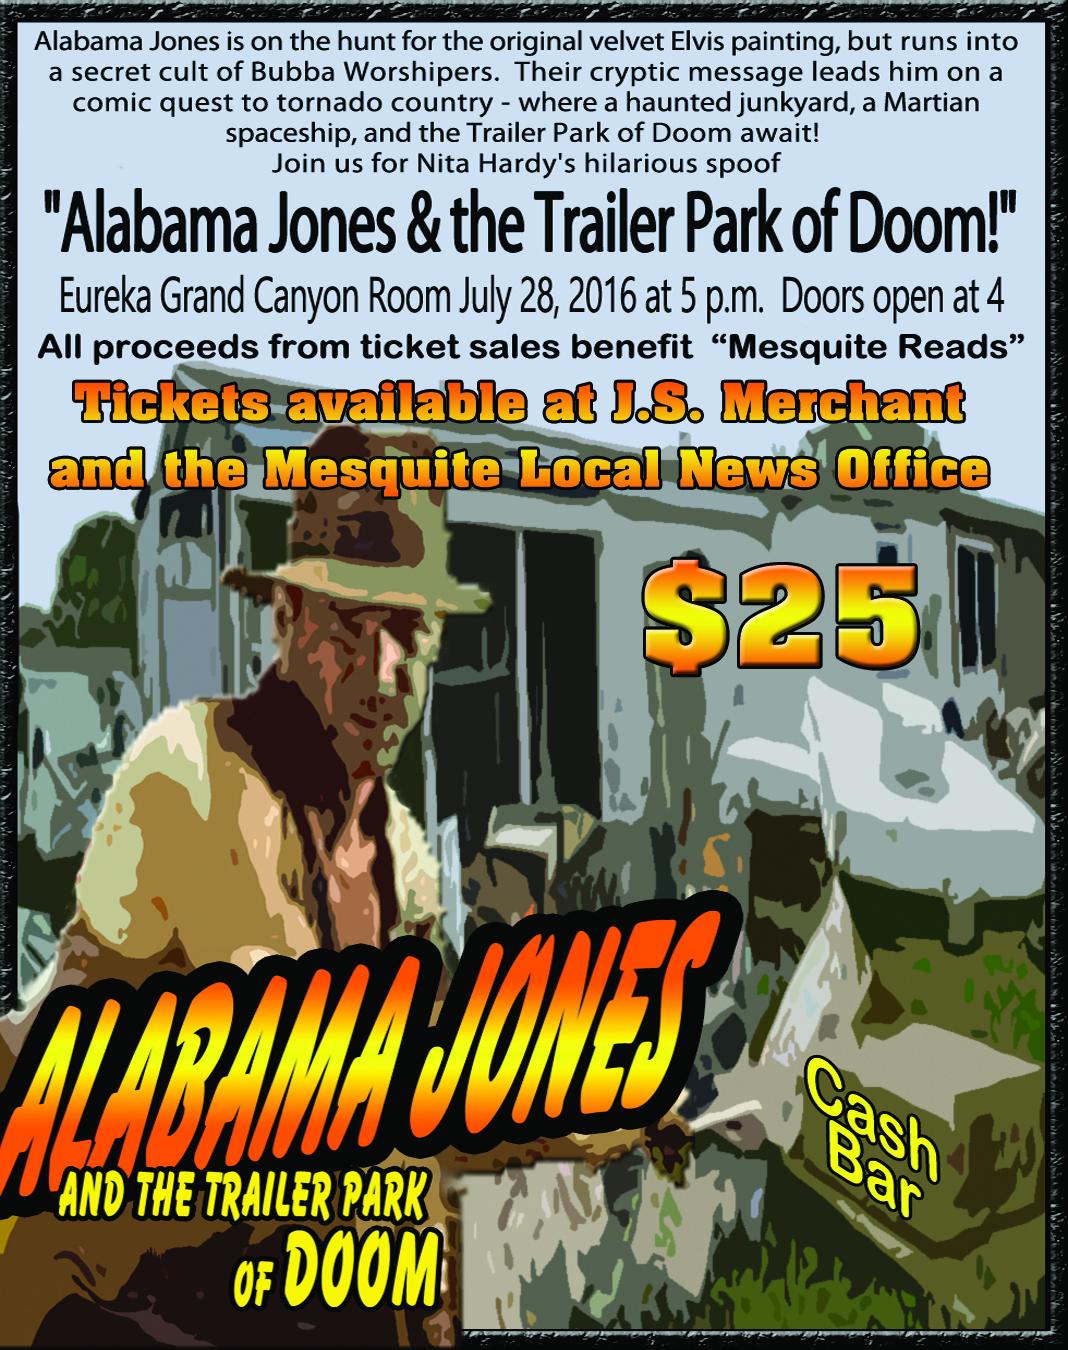 Alabama Jones Murder Mystery to benefit Mesquite Reads